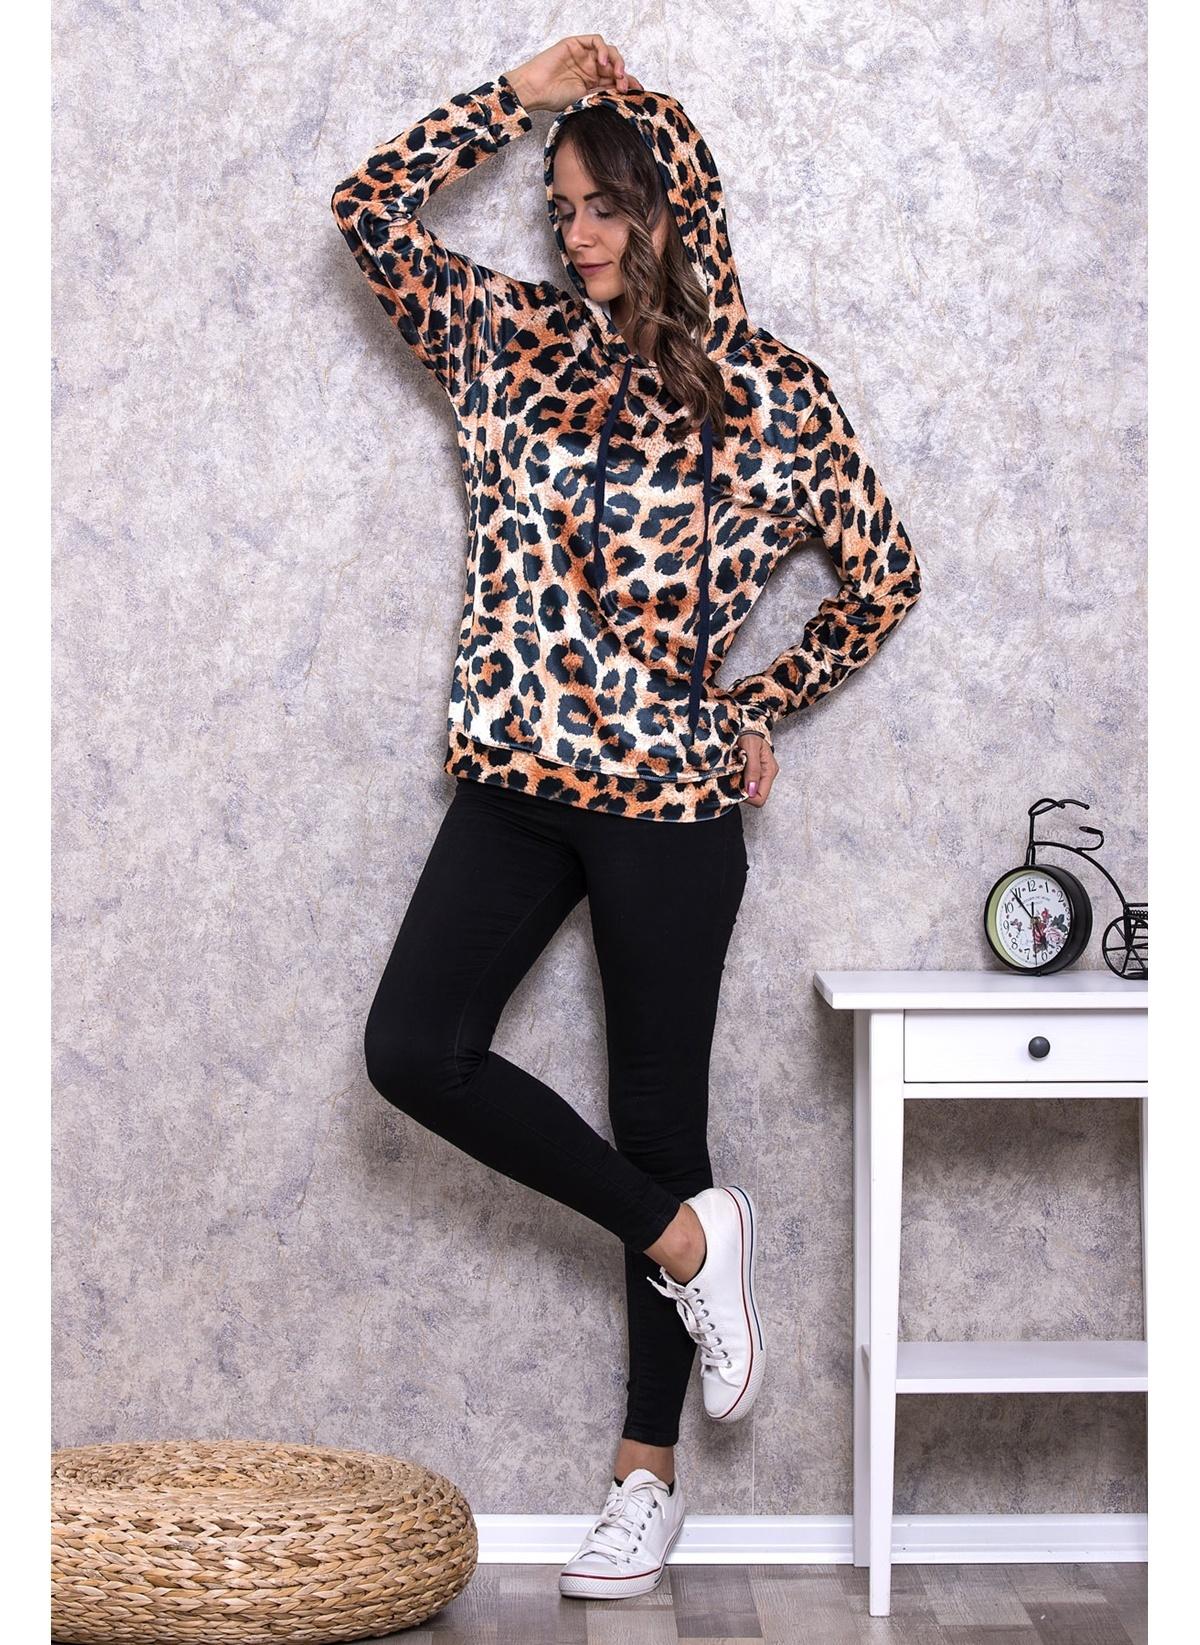 Lingabooms Sweatshirt Mde011 Kadın Kapüşonlu Sweatshirt – 49.99 TL